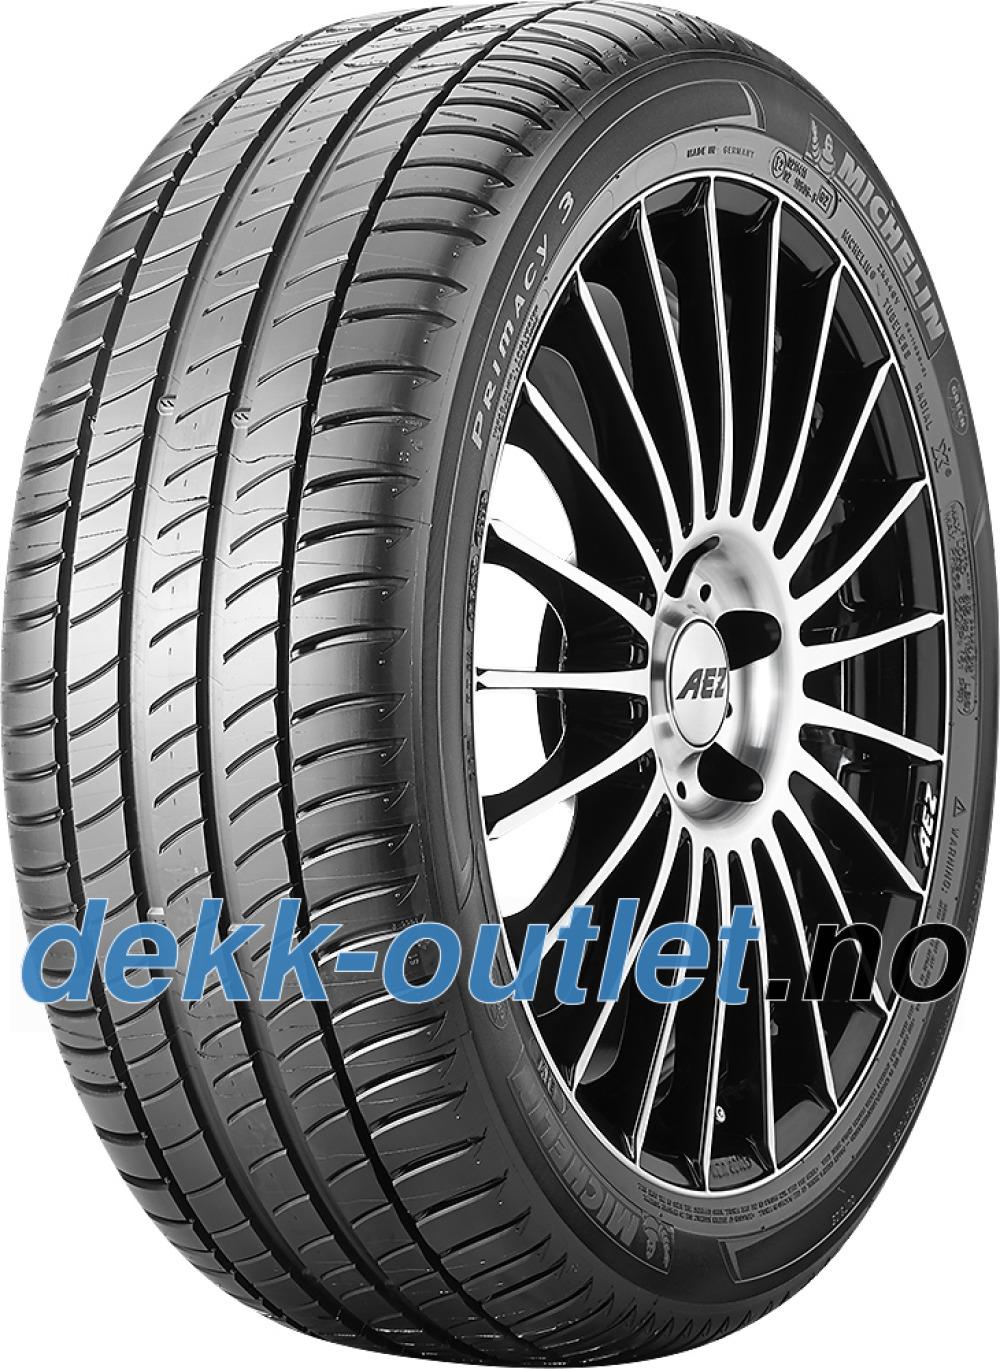 Michelin Primacy 3 ( 215/60 R16 99H XL med felgbeskyttelseslist (FSL) )